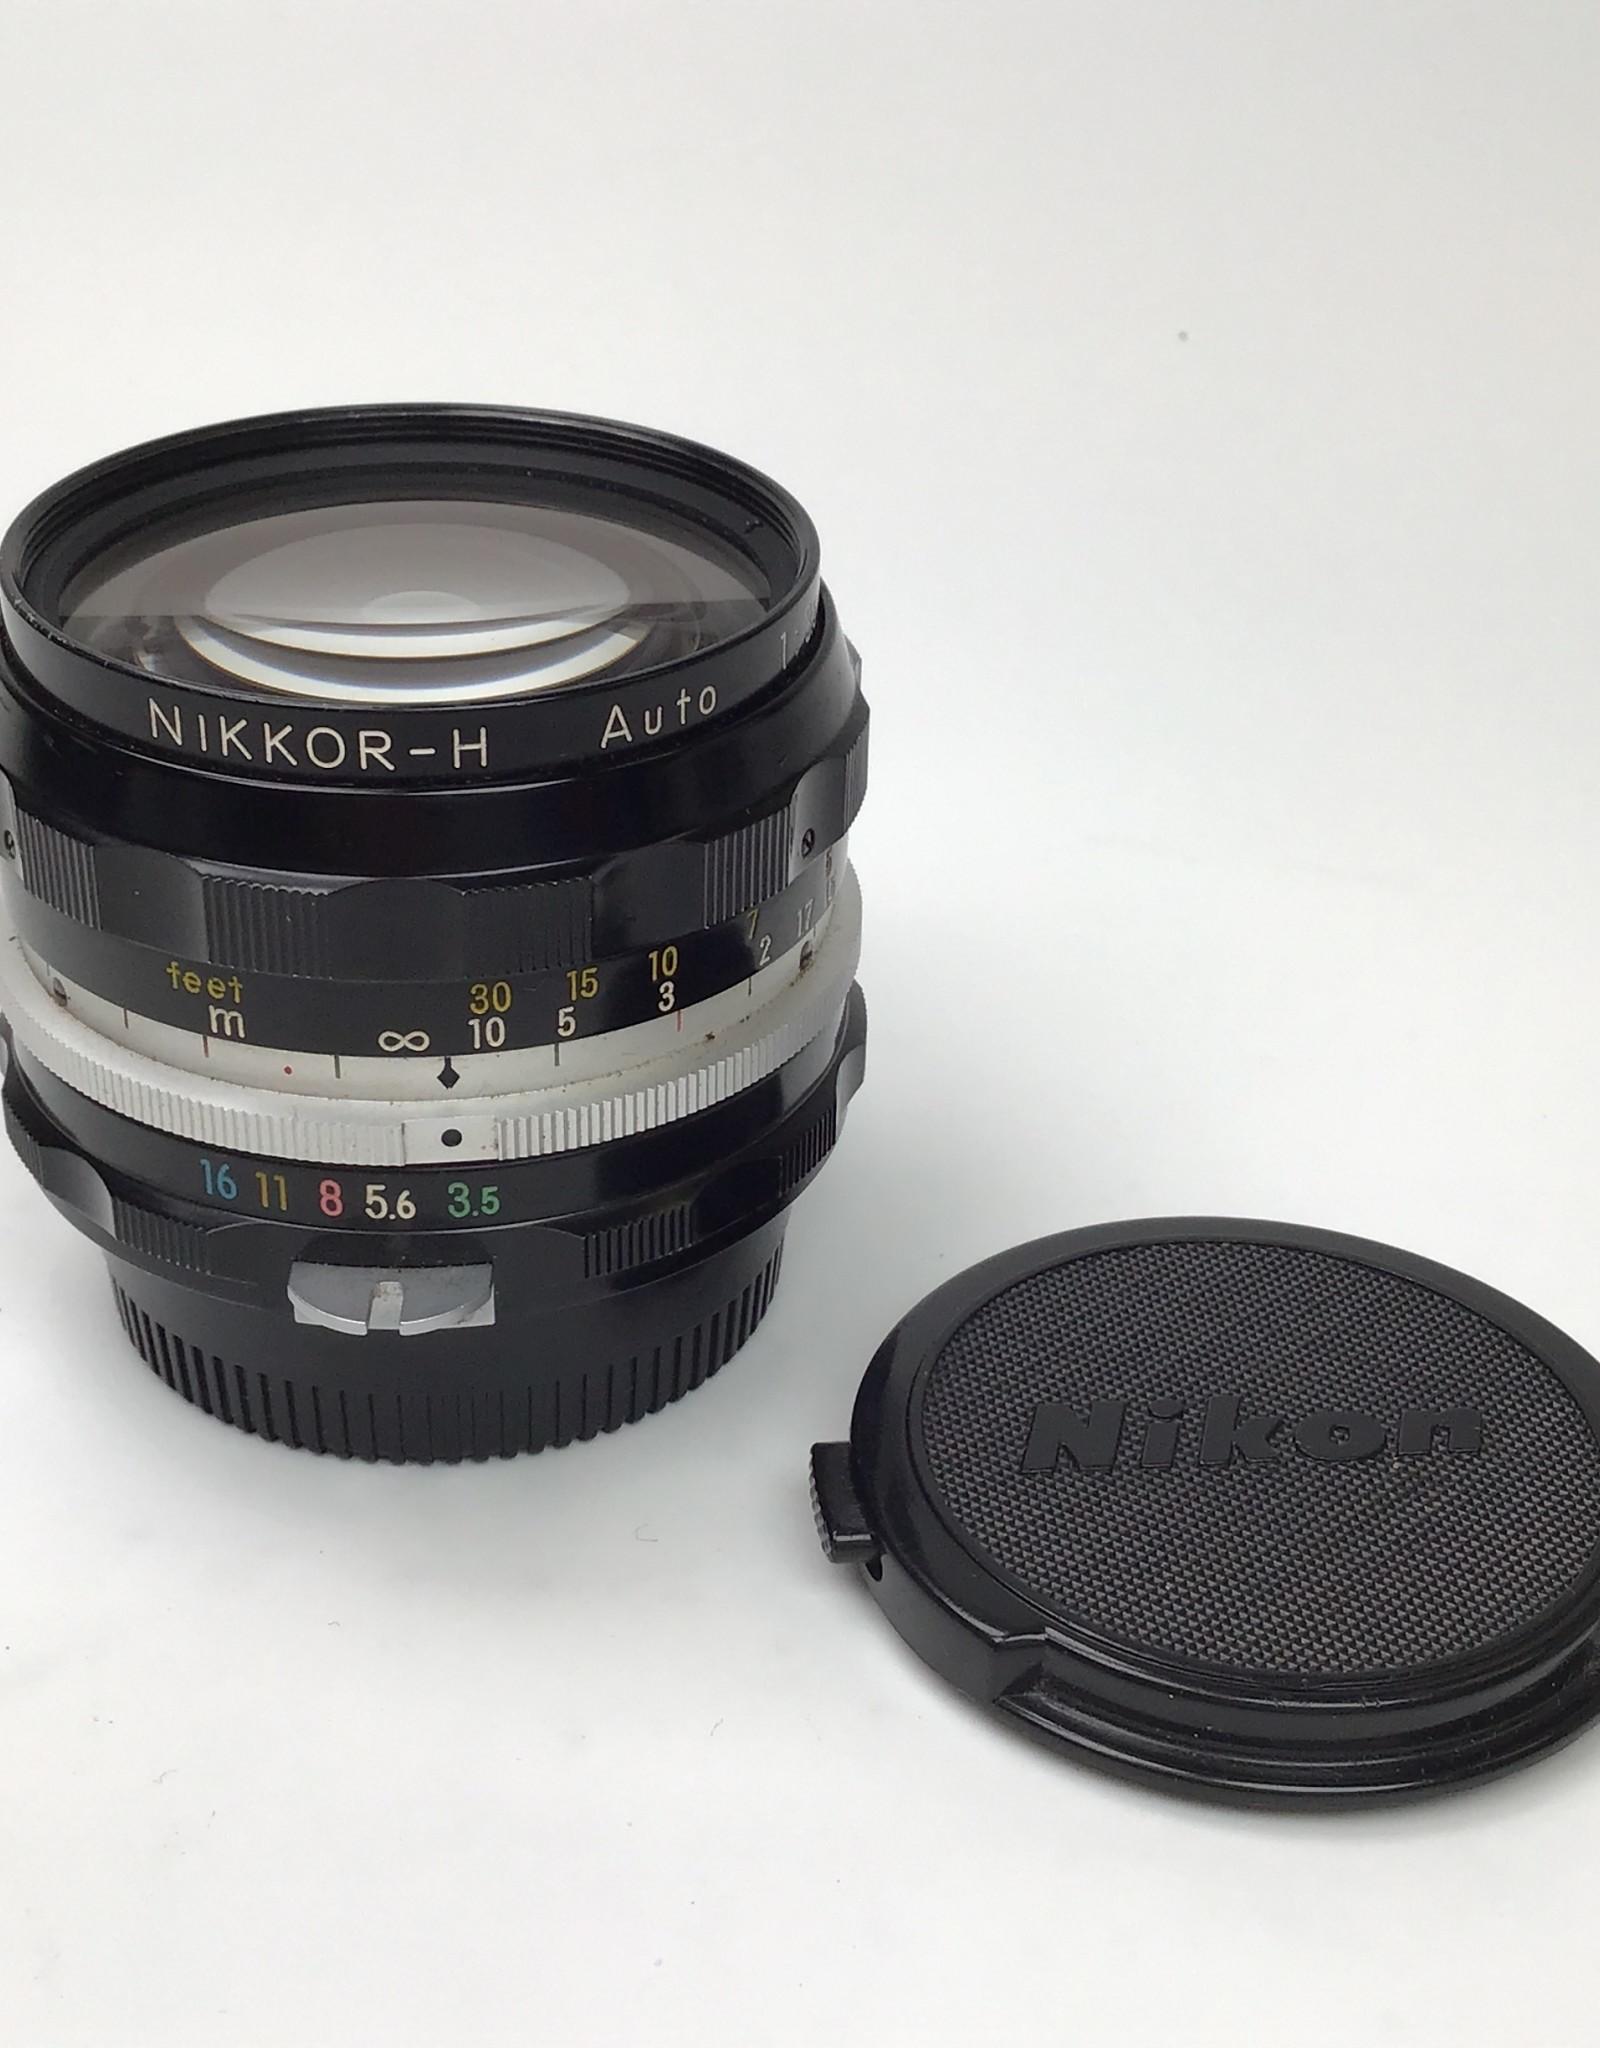 NIKON Nikon Nikkor-H 28mm f3.5 Non AI Lens Used Good